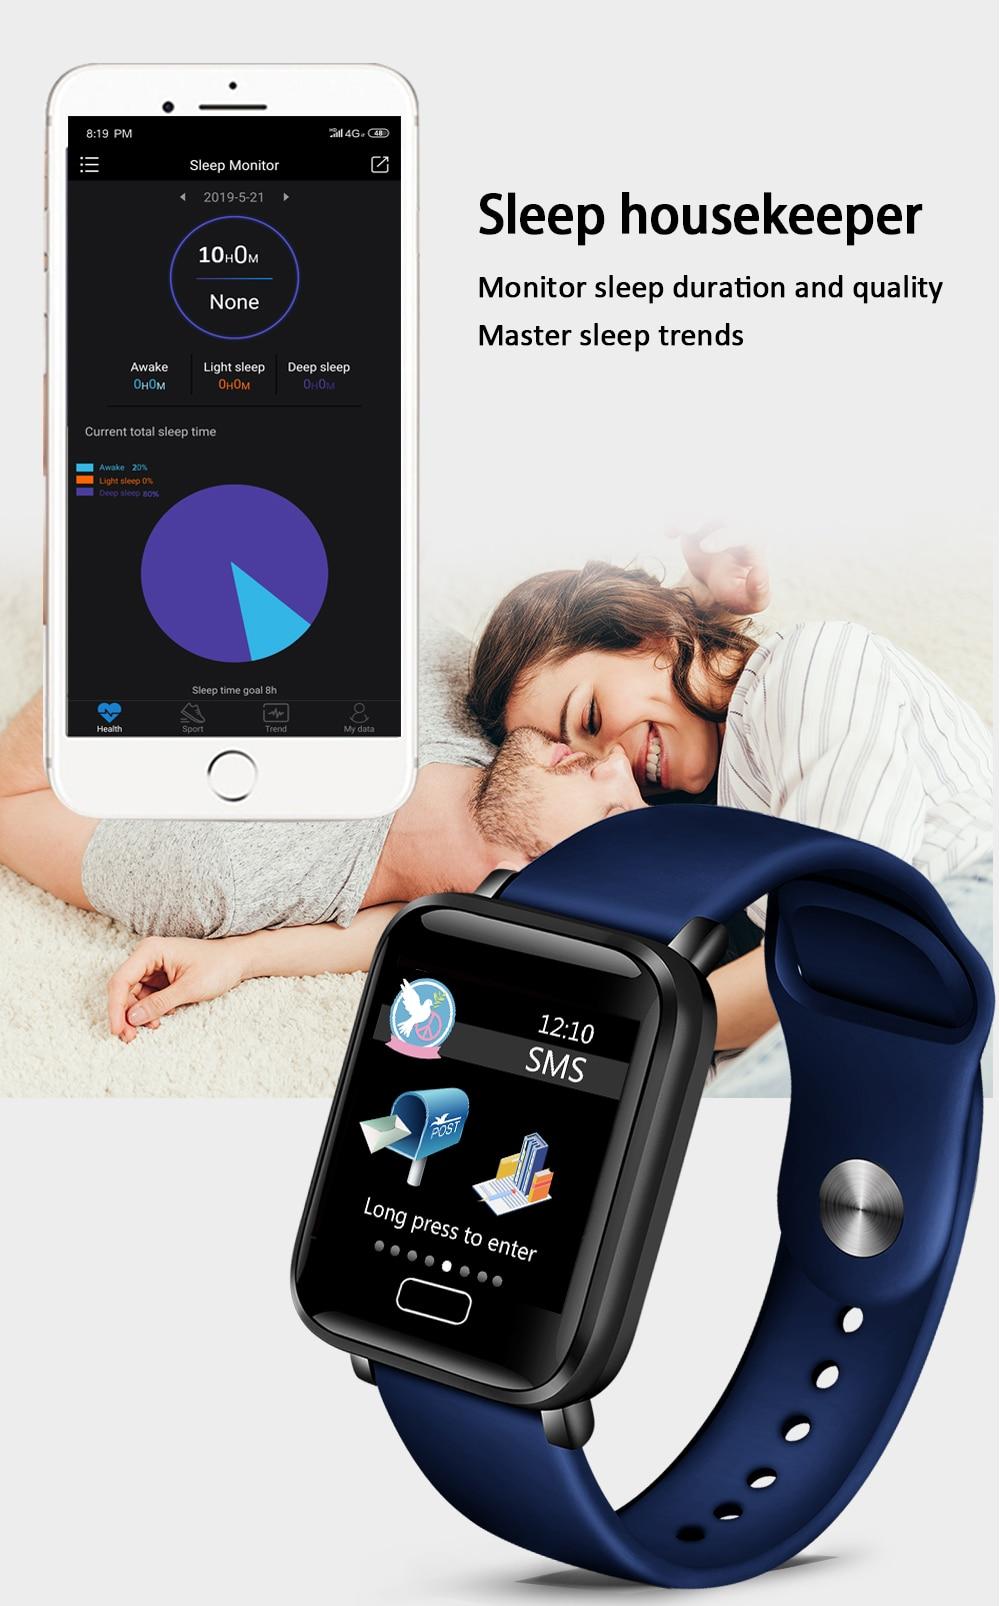 HTB1Uplca4D1gK0jSZFKq6AJrVXaC LIGE Smart Bracelet Women IP67 Waterproof Fitness Tracker Wristband Pedometer Heart Rate Monitor Sport Smart watch Android ios